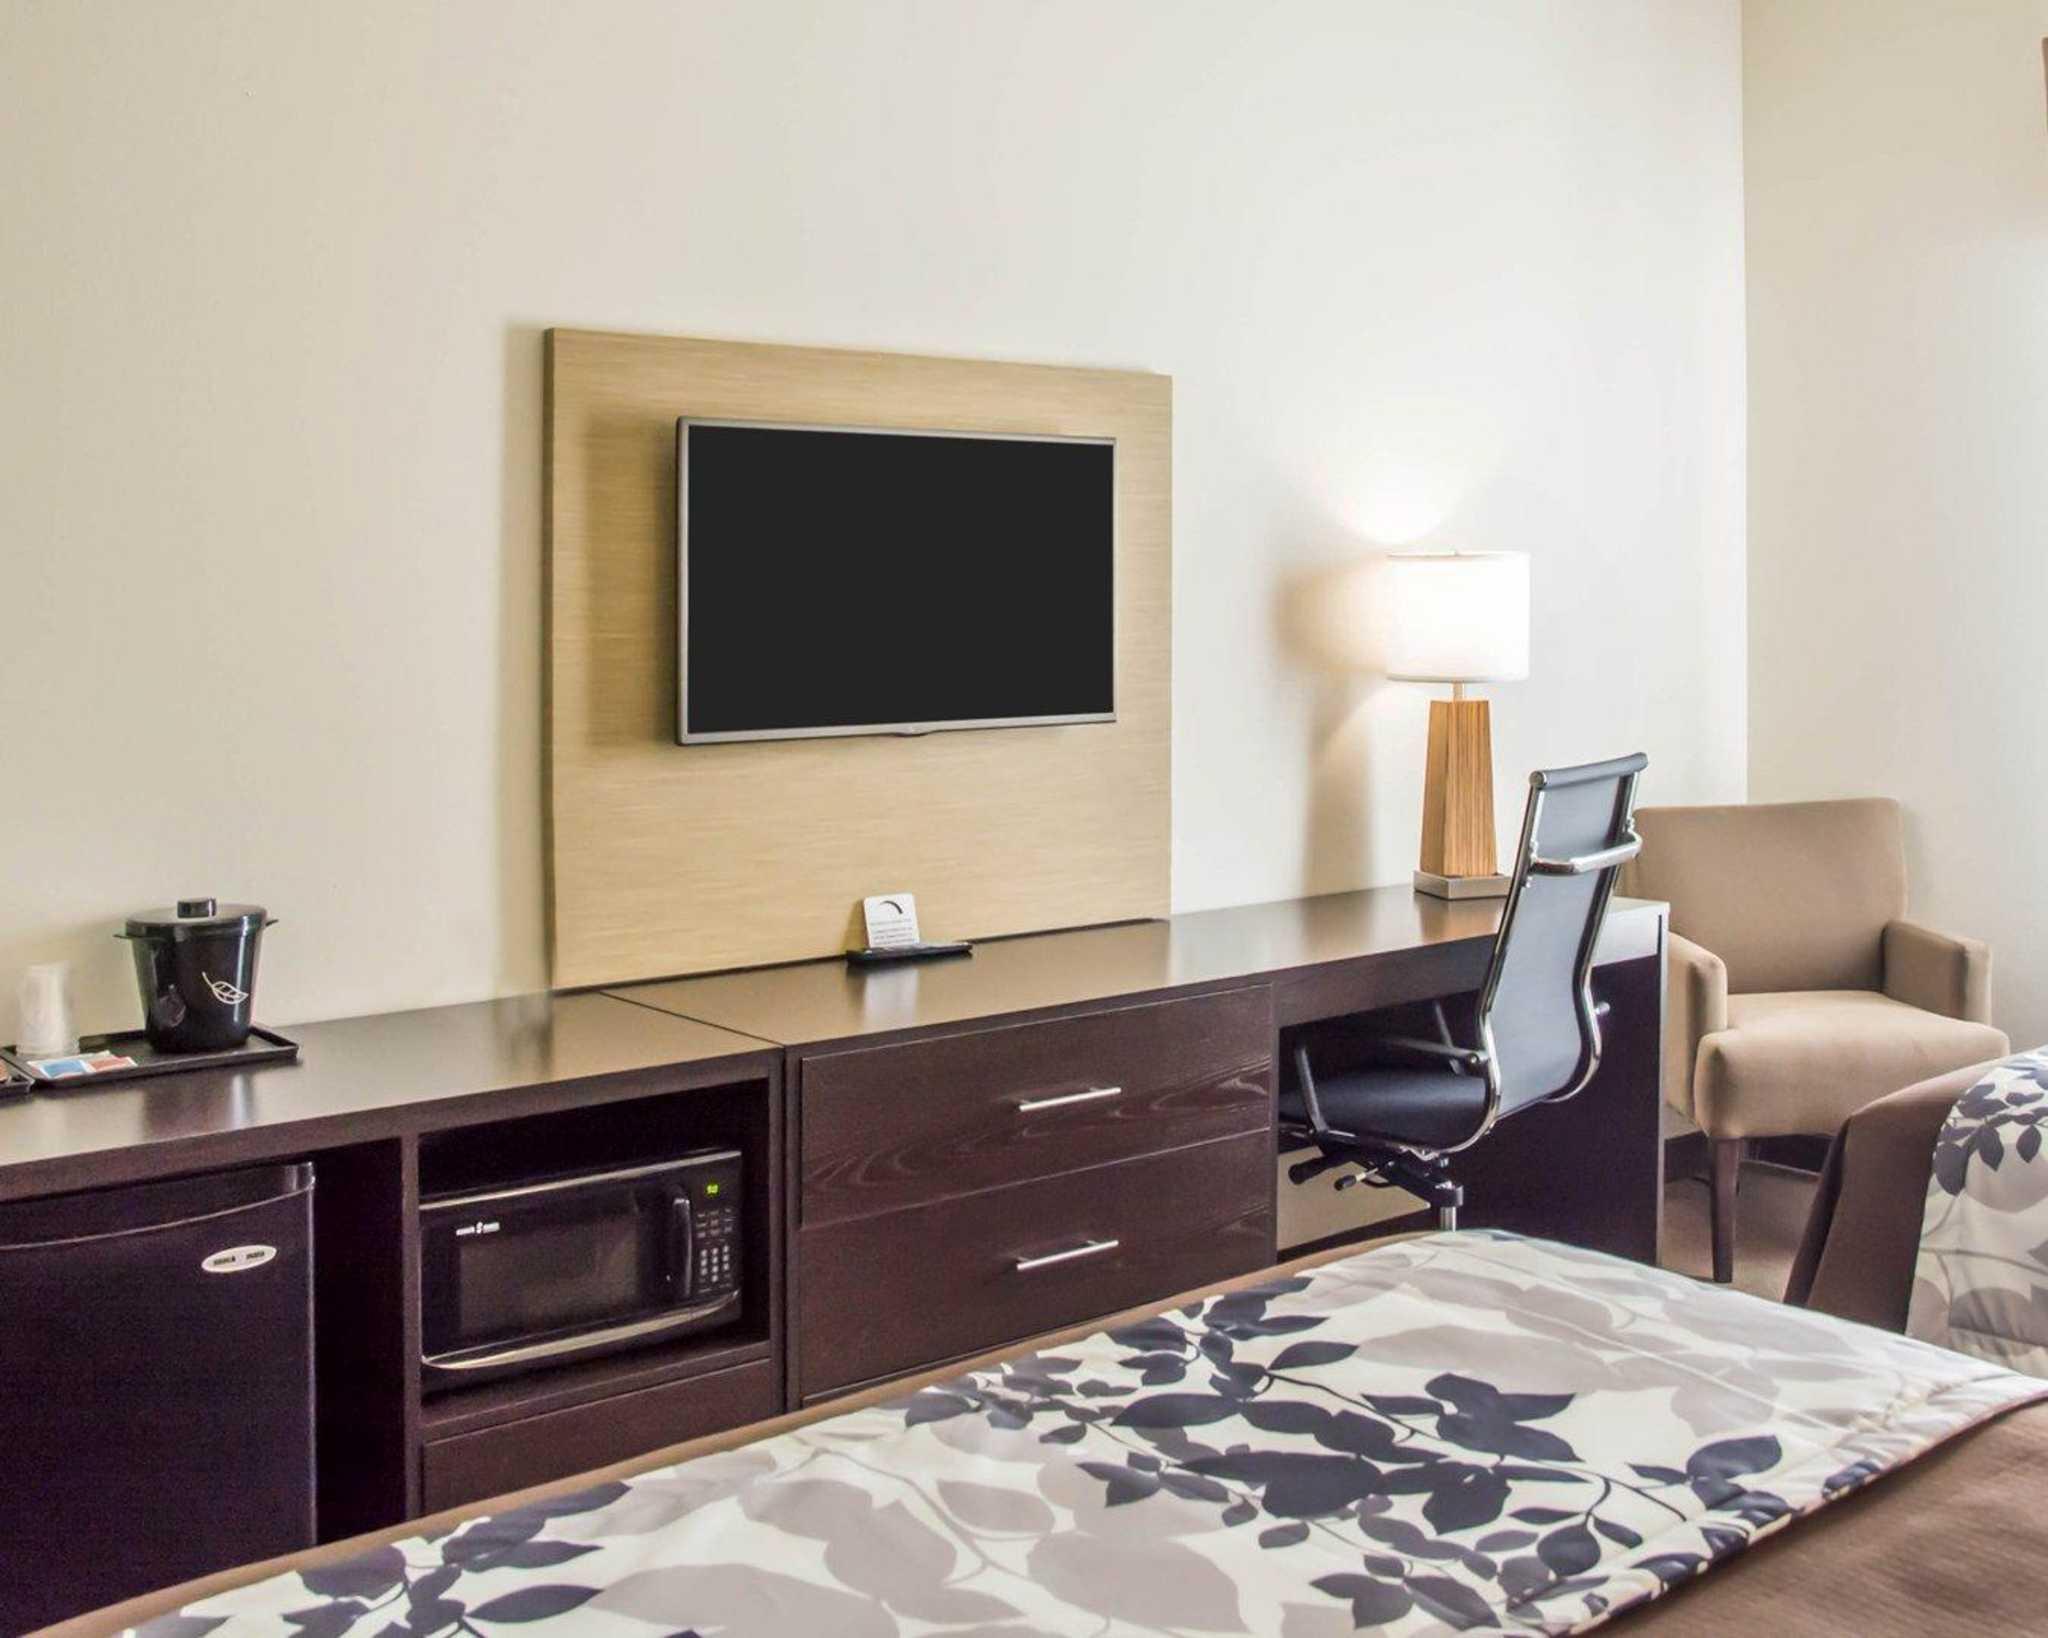 Sleep Inn & Suites Parkersburg-Marietta image 17